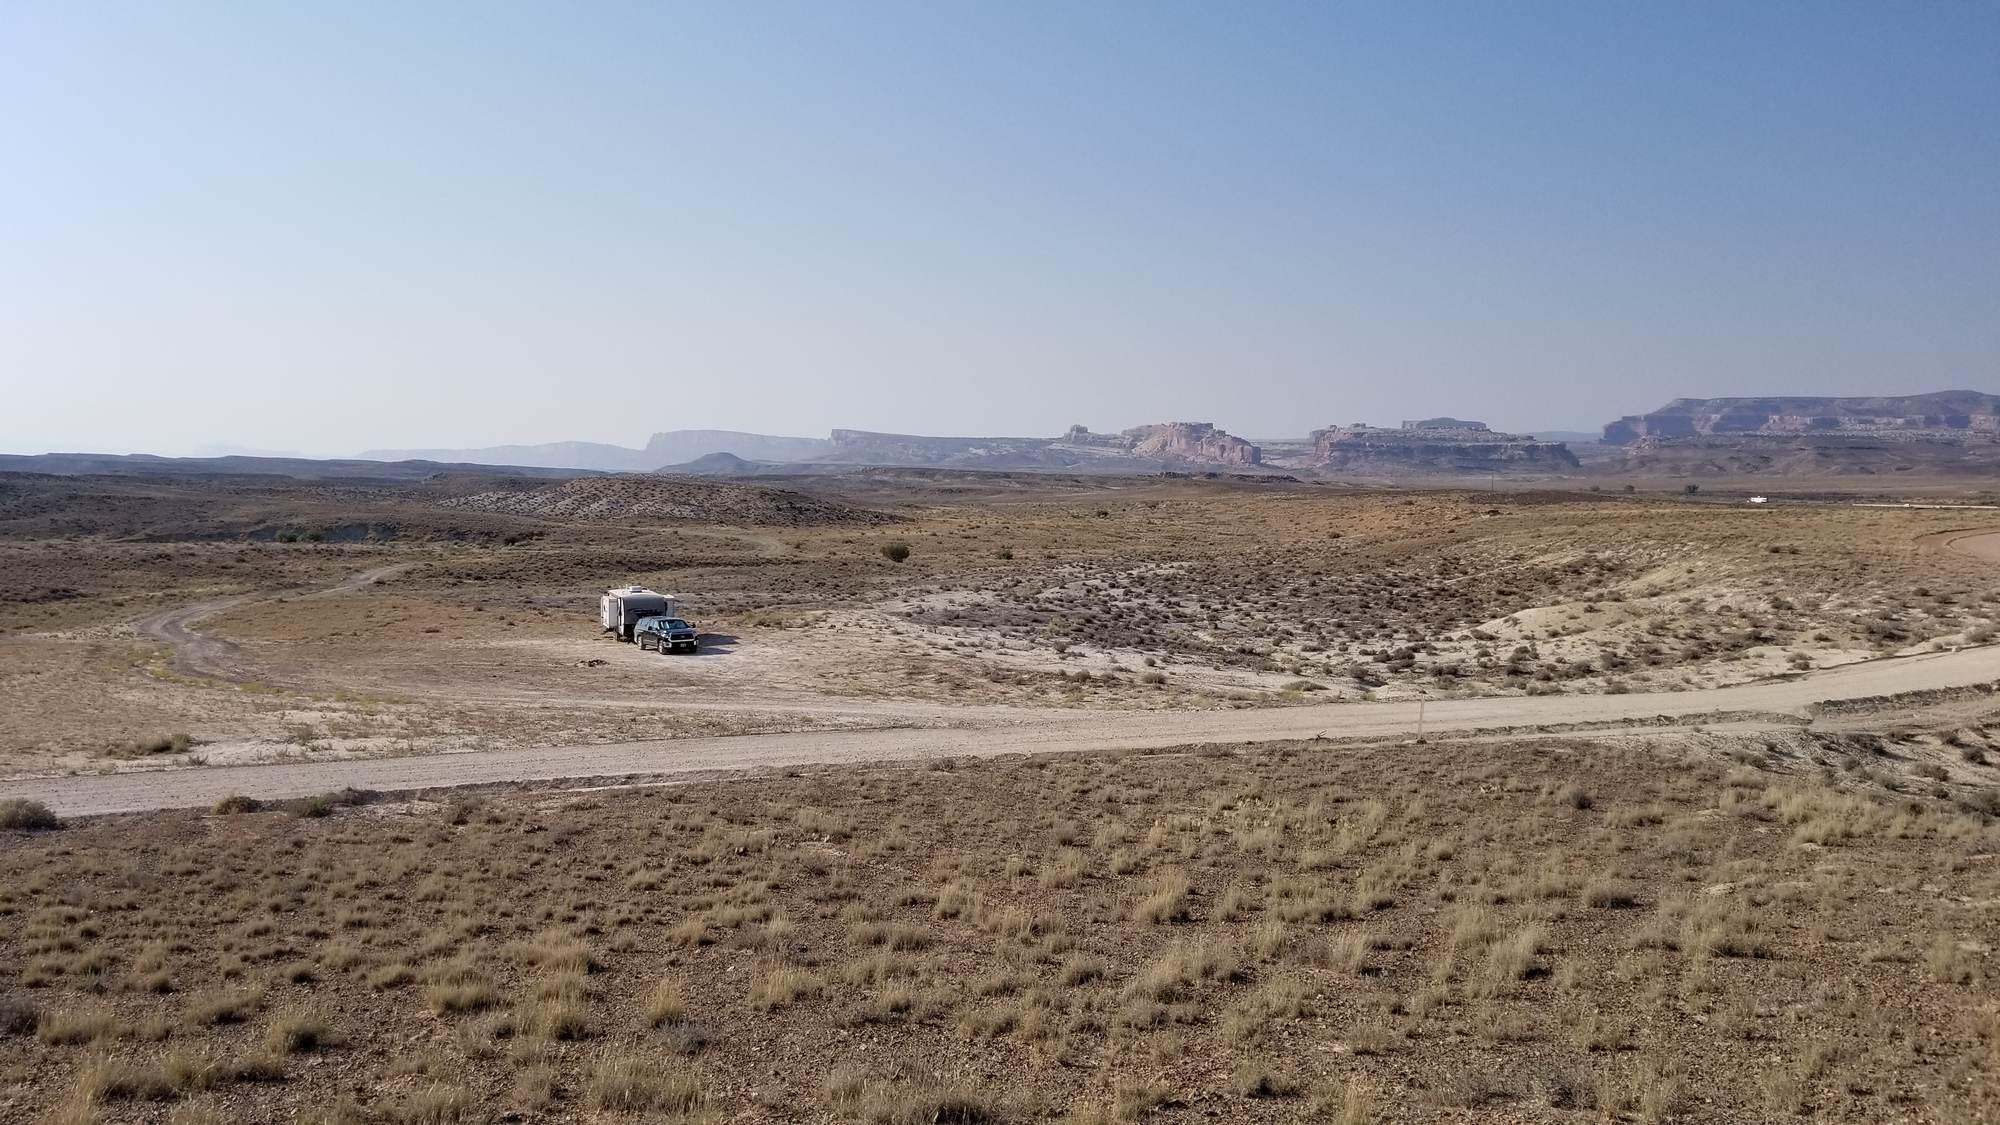 Boondocking on state land along Klondike Bluffs Road, north of Moab, Utah